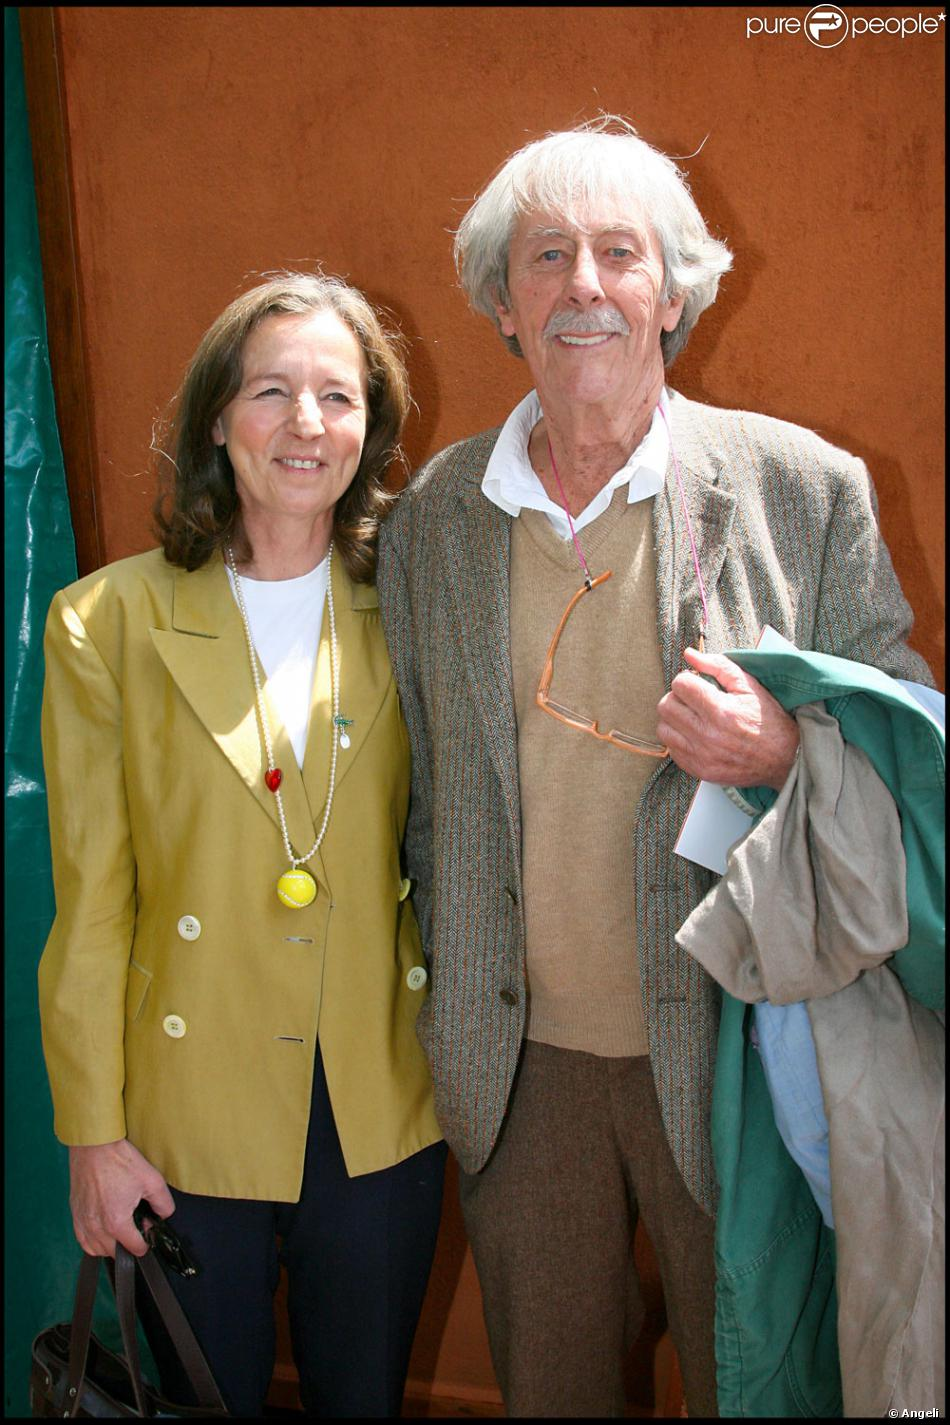 Jean rochefort et sa femme roland garros - Jean francois balmer et sa femme ...